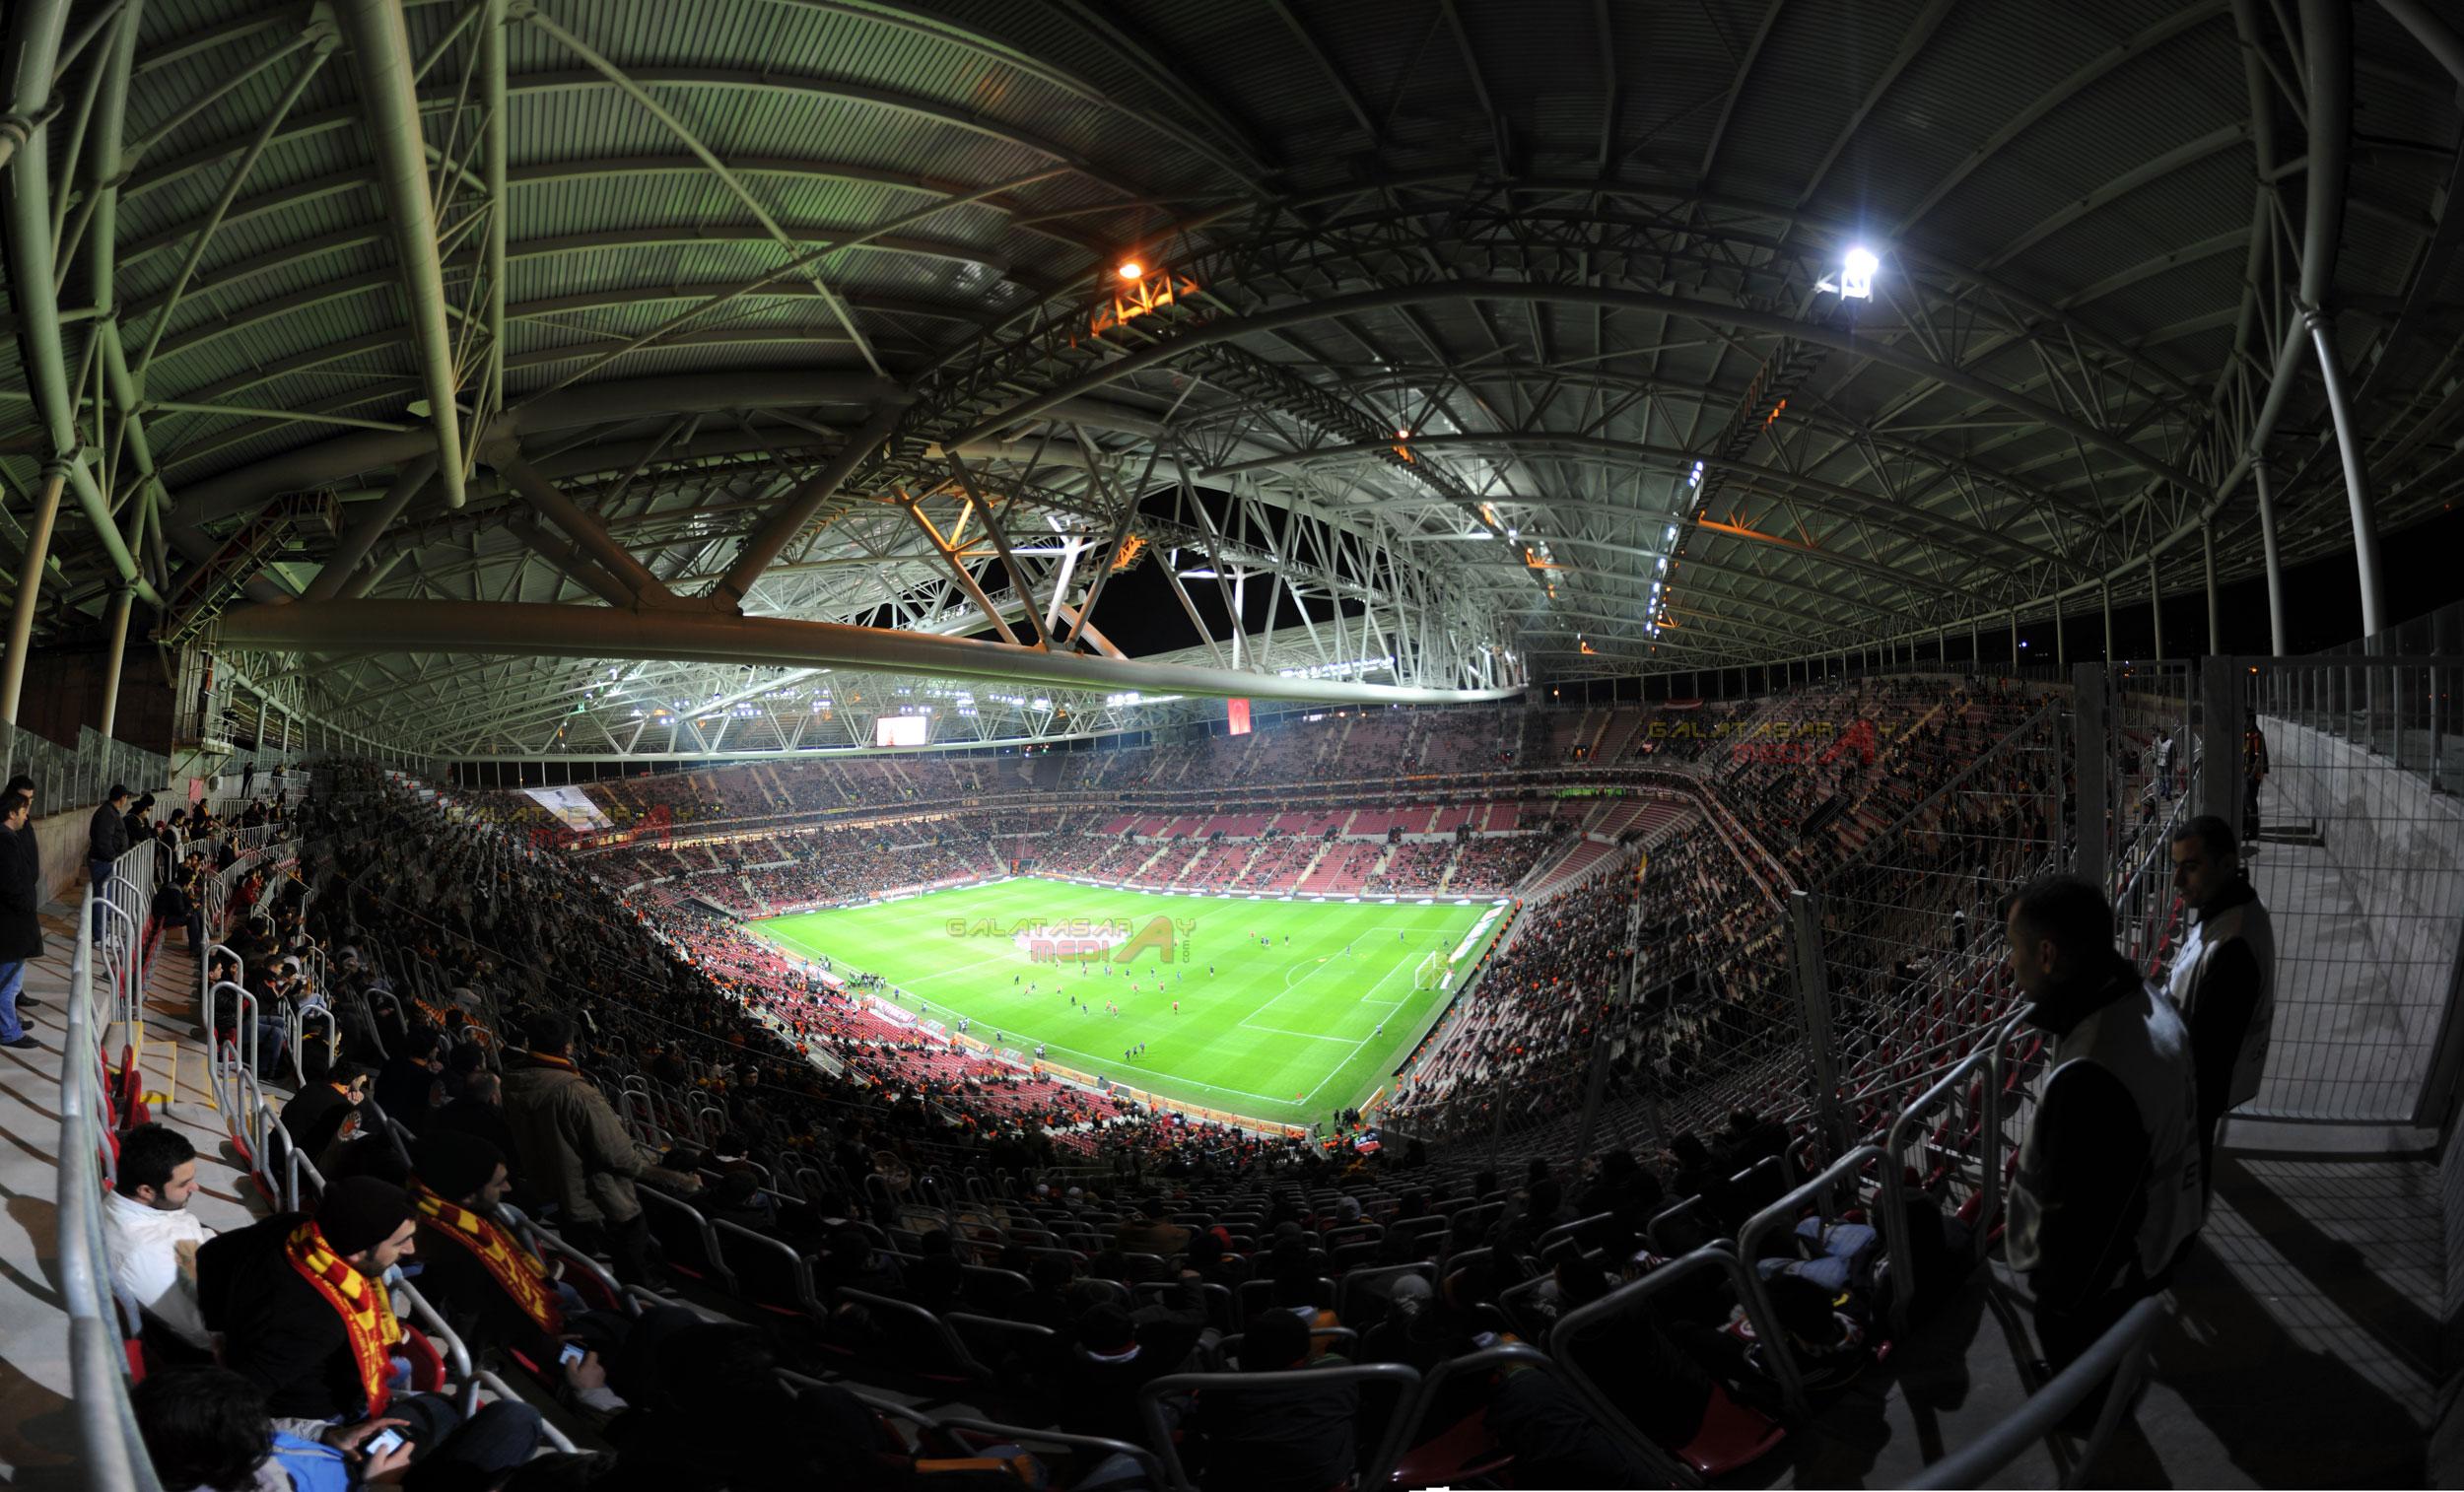 galatasaray stadium  istanbul by volkanbaba d45uunr Galatasaray HD masaüstü duvar kağıdı resimleri